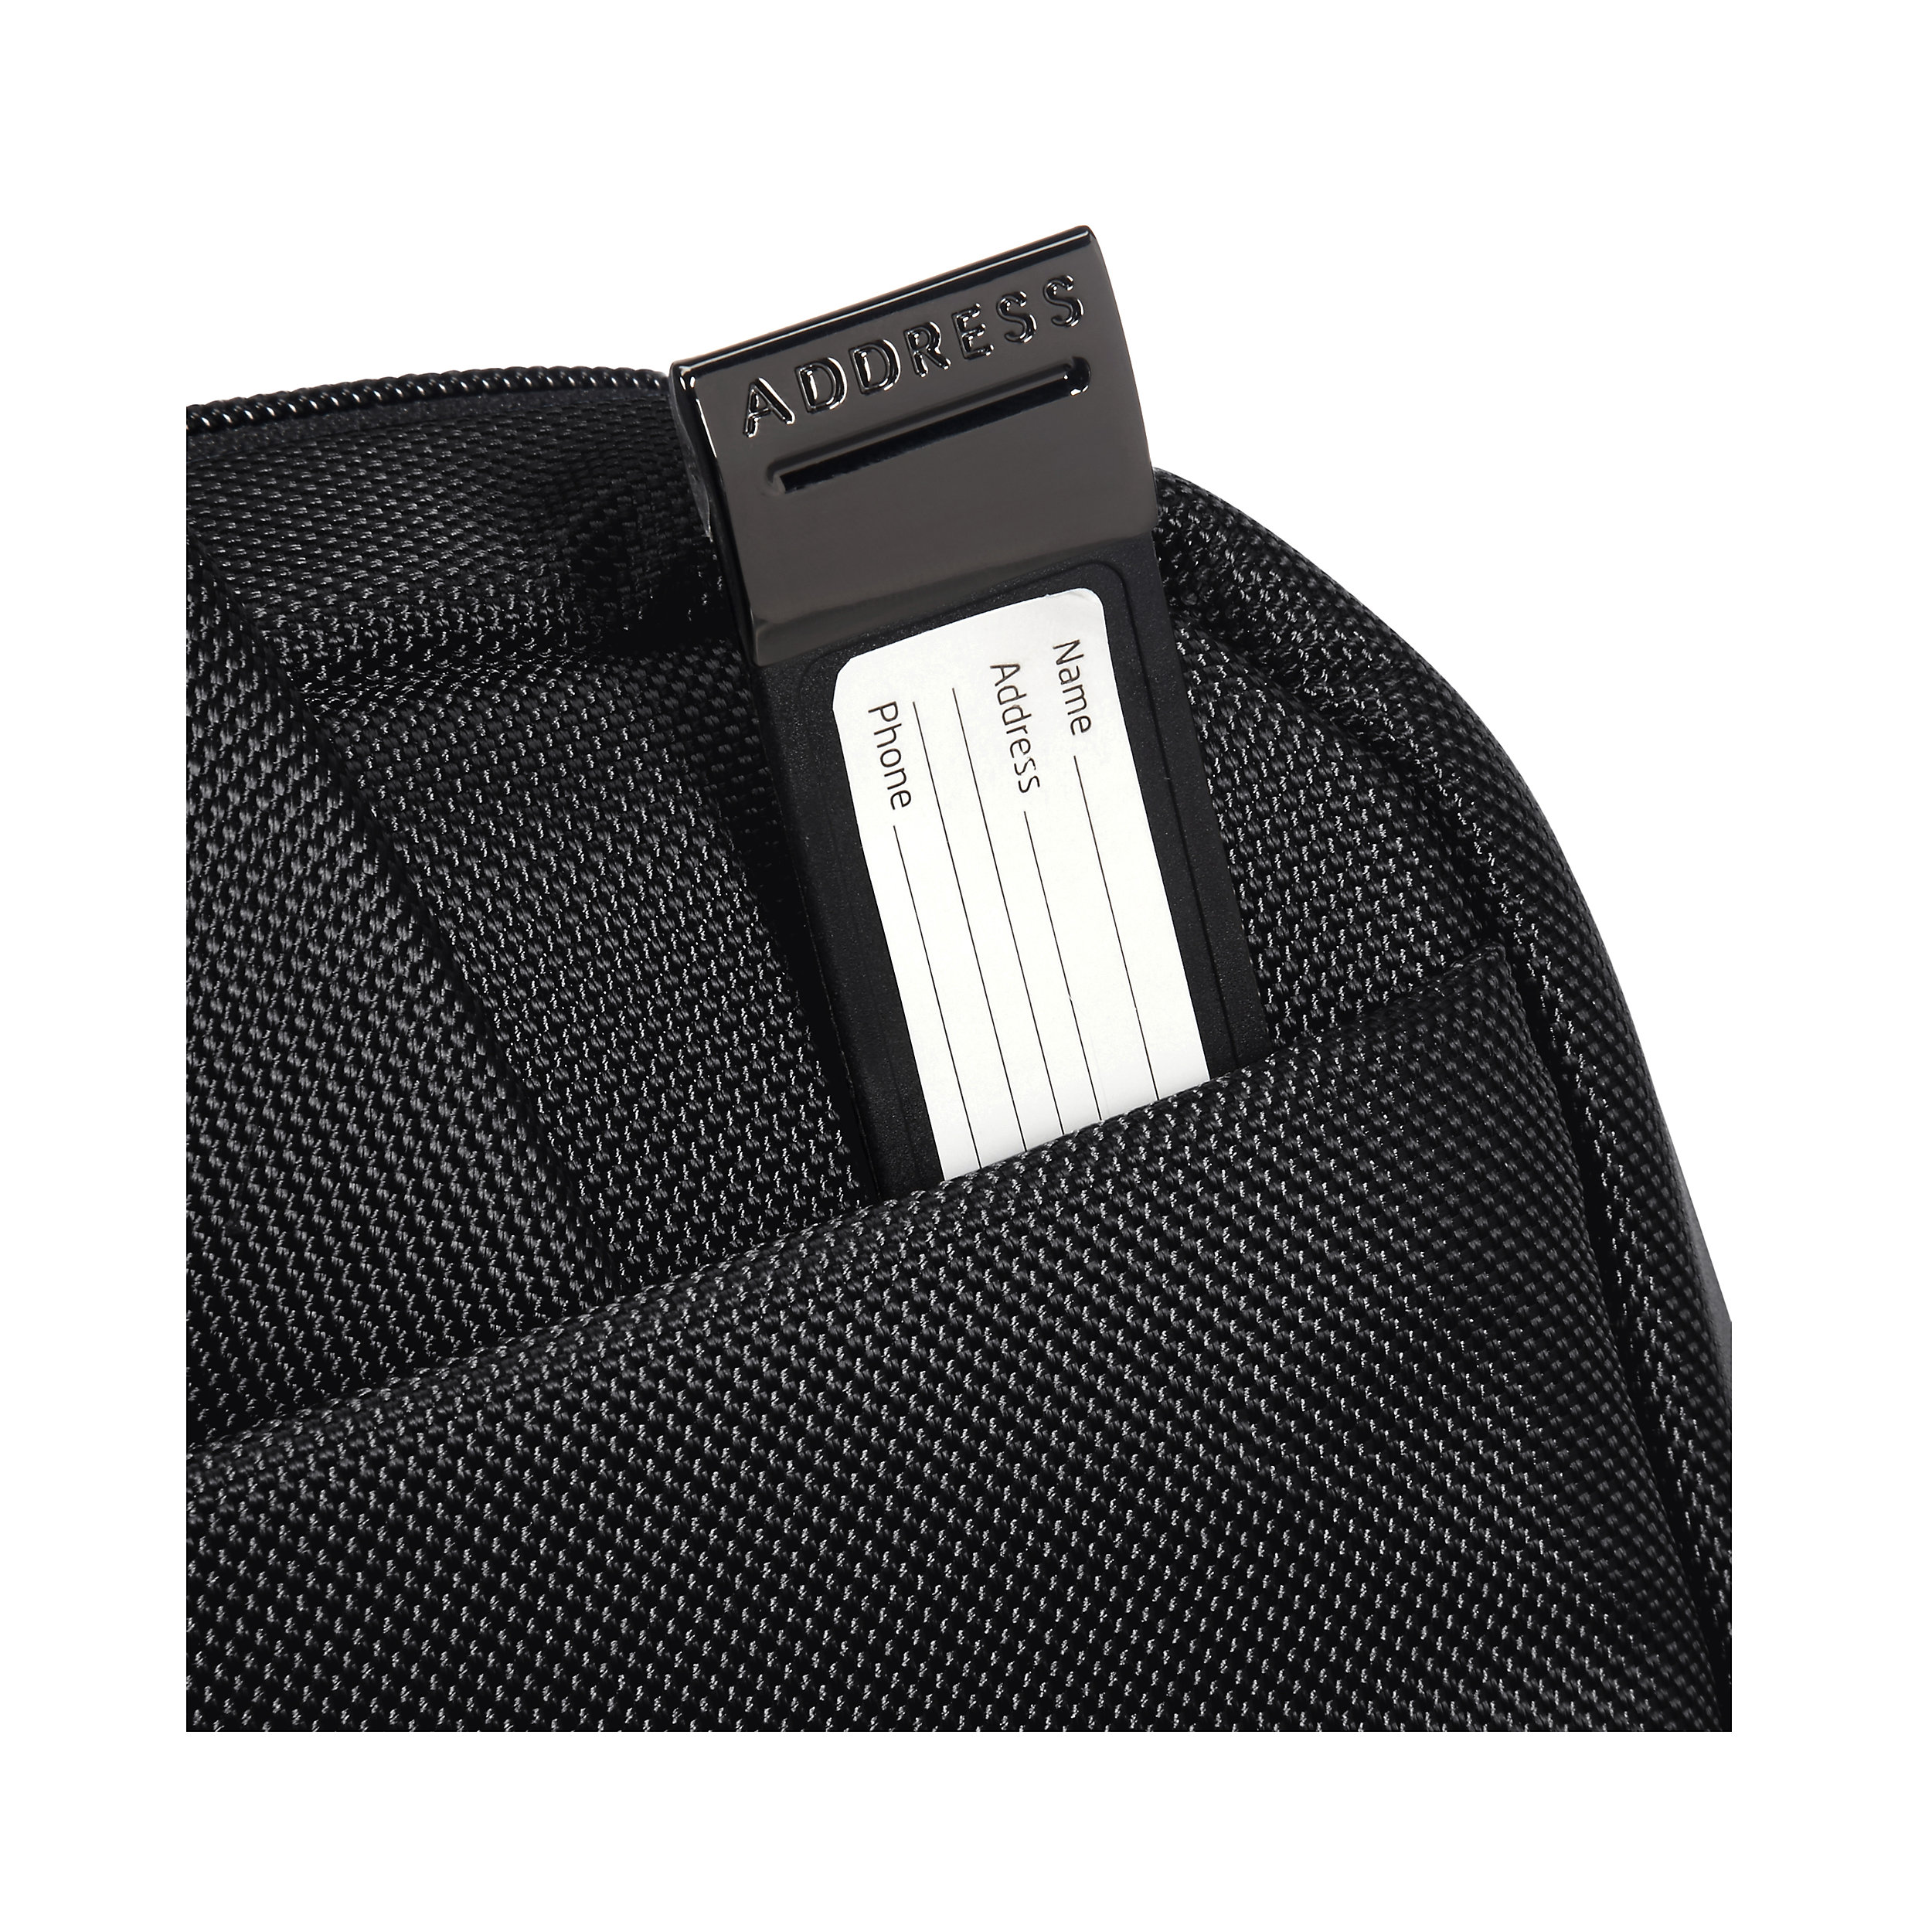 "Laptop Bailhandle 14,1"" RFID Pro-DLX5 8.5 Liter"